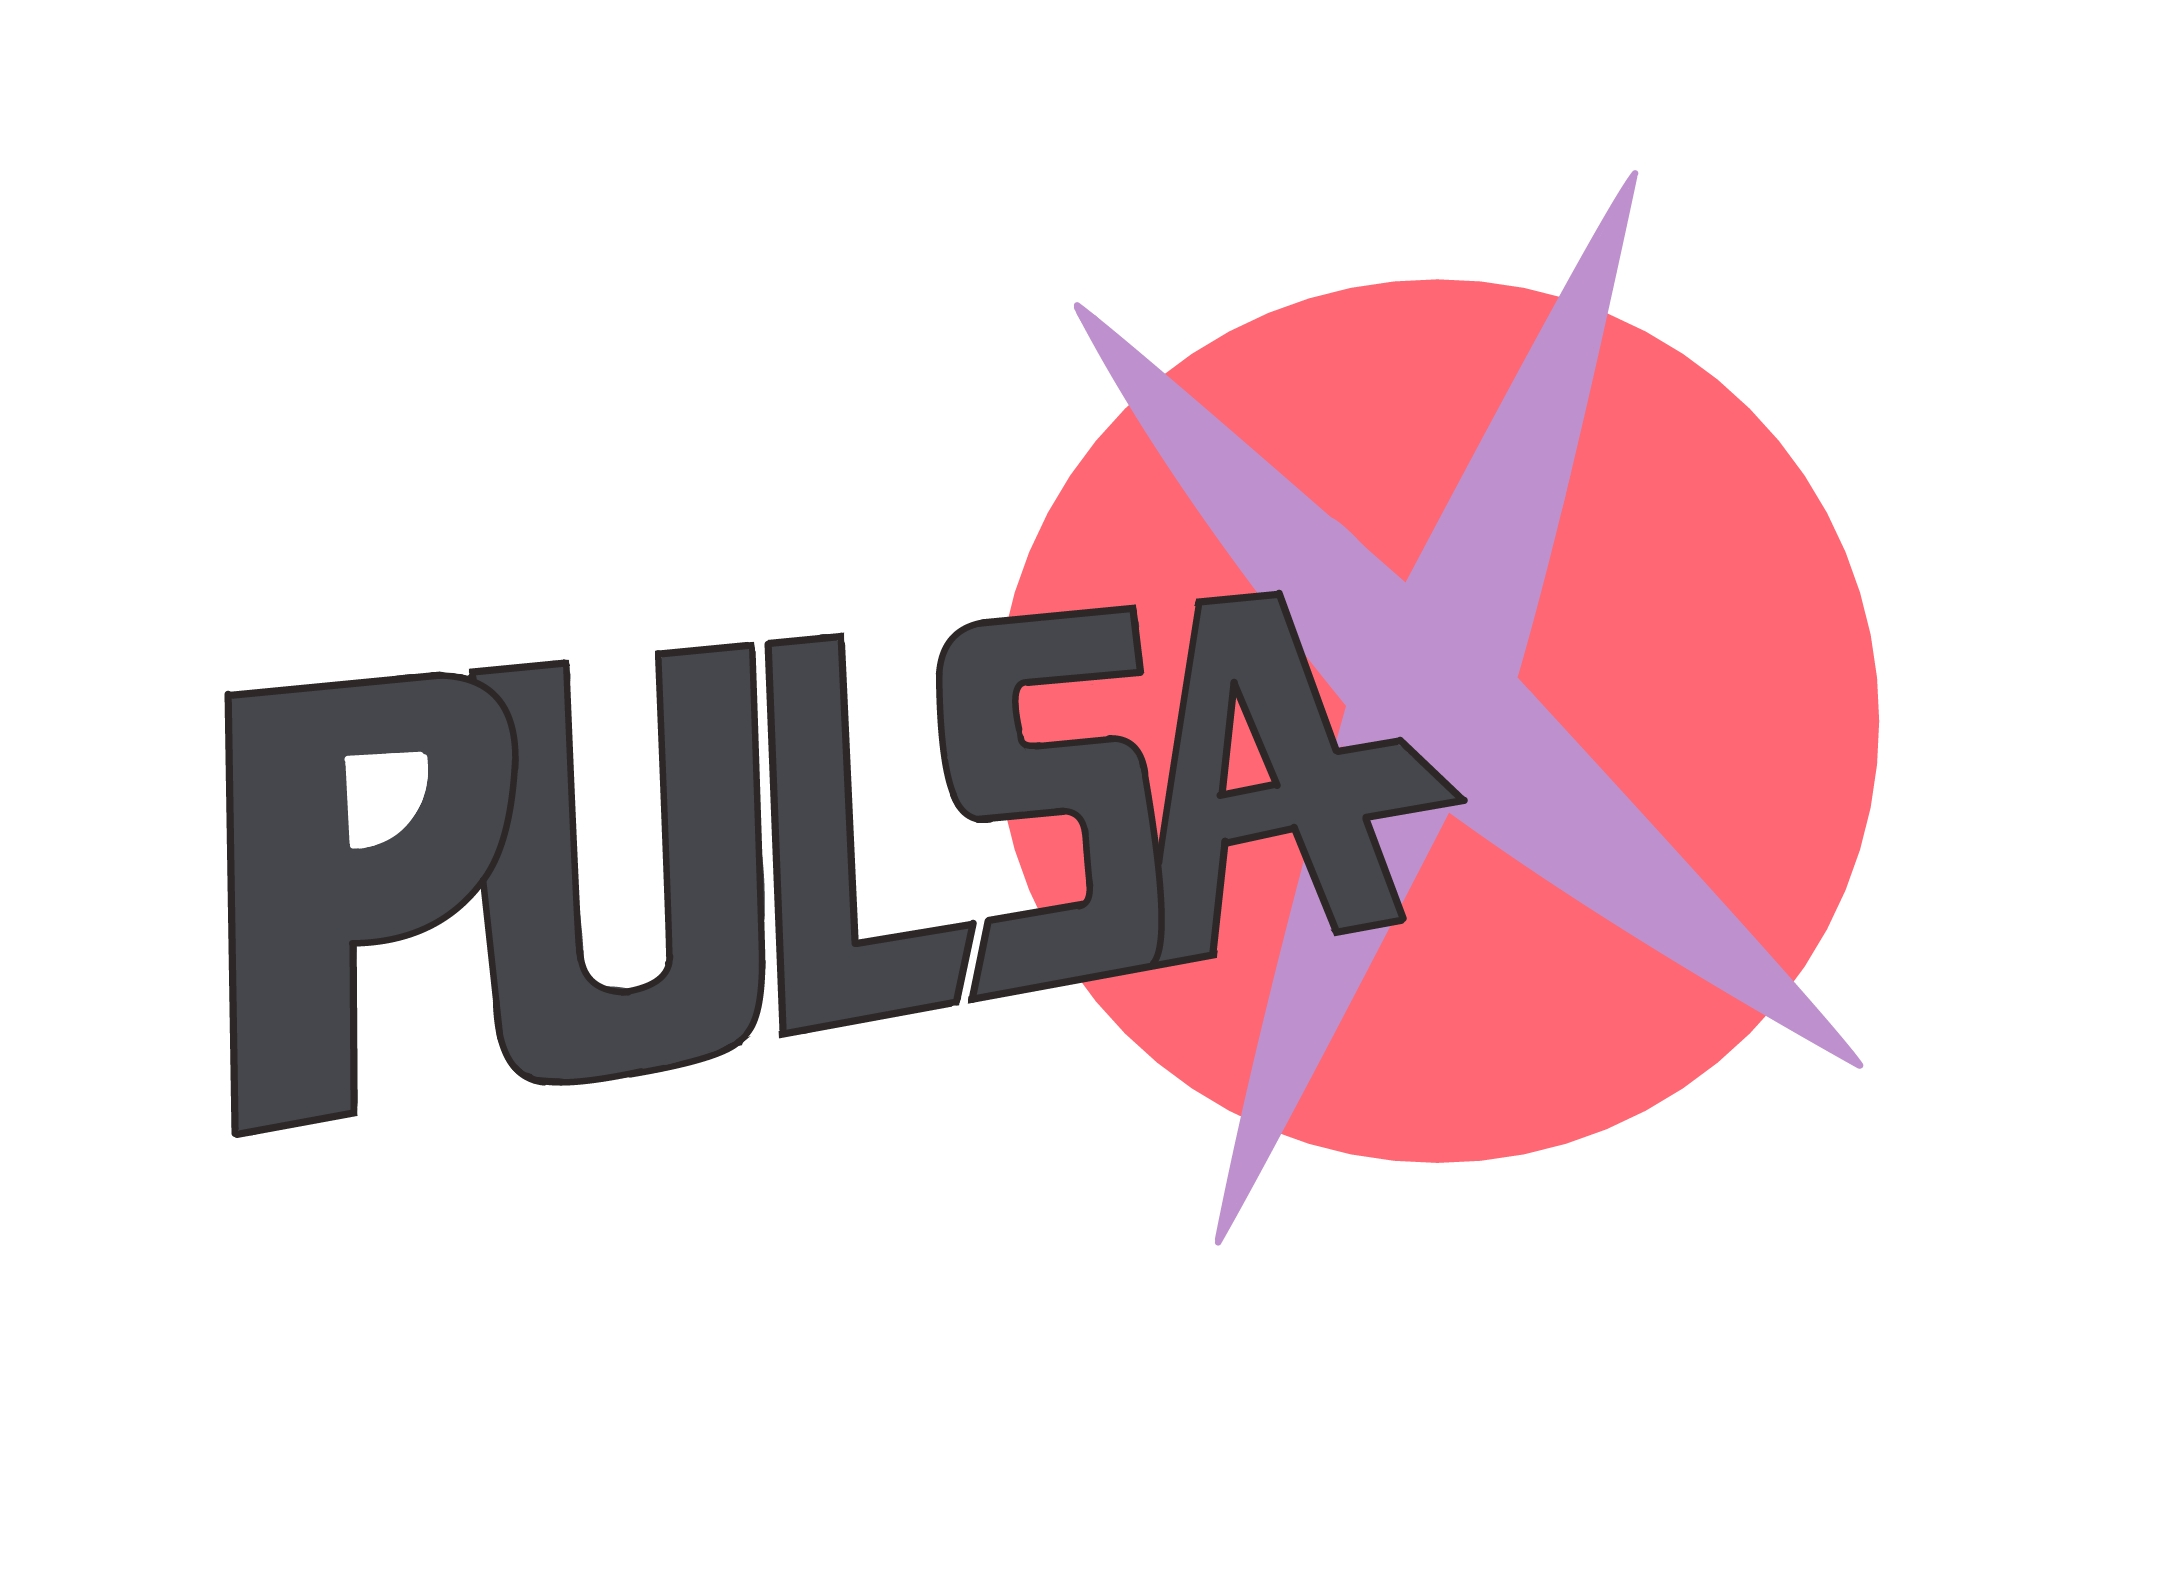 PULSAX-PROGRAMA9